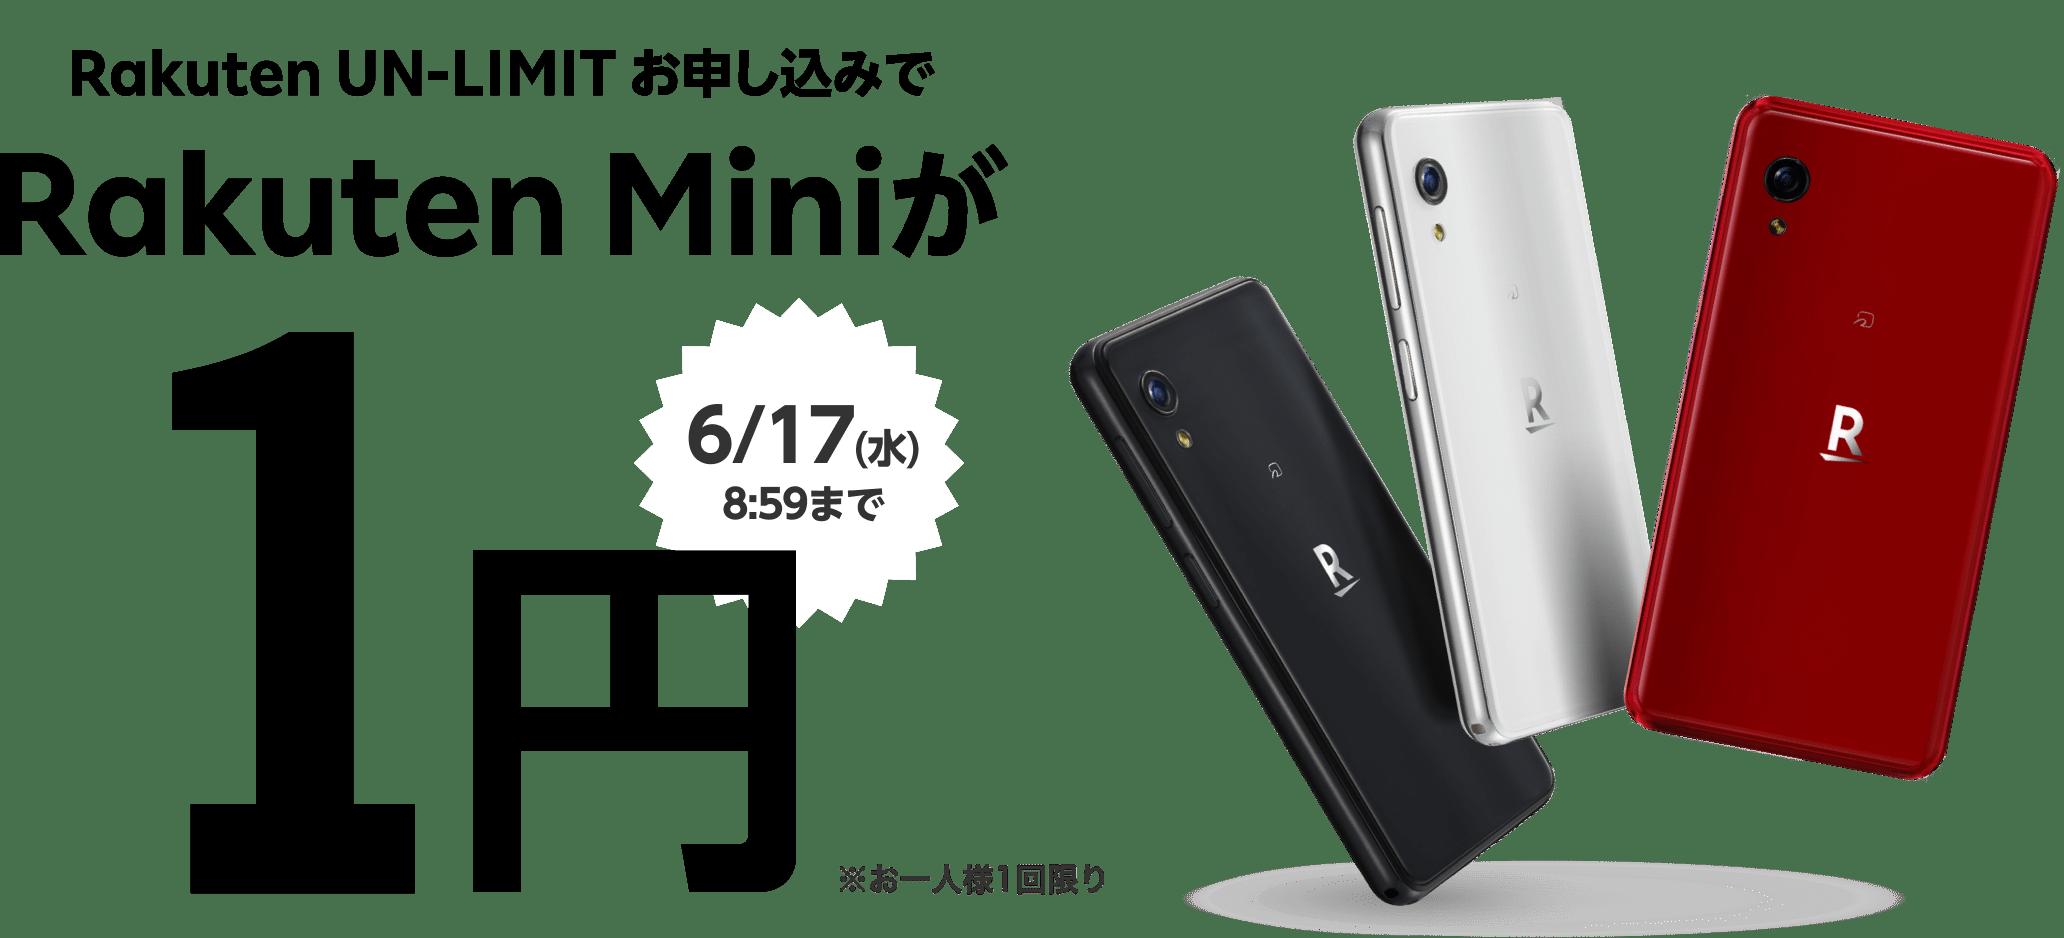 Rakuten Mini 1円